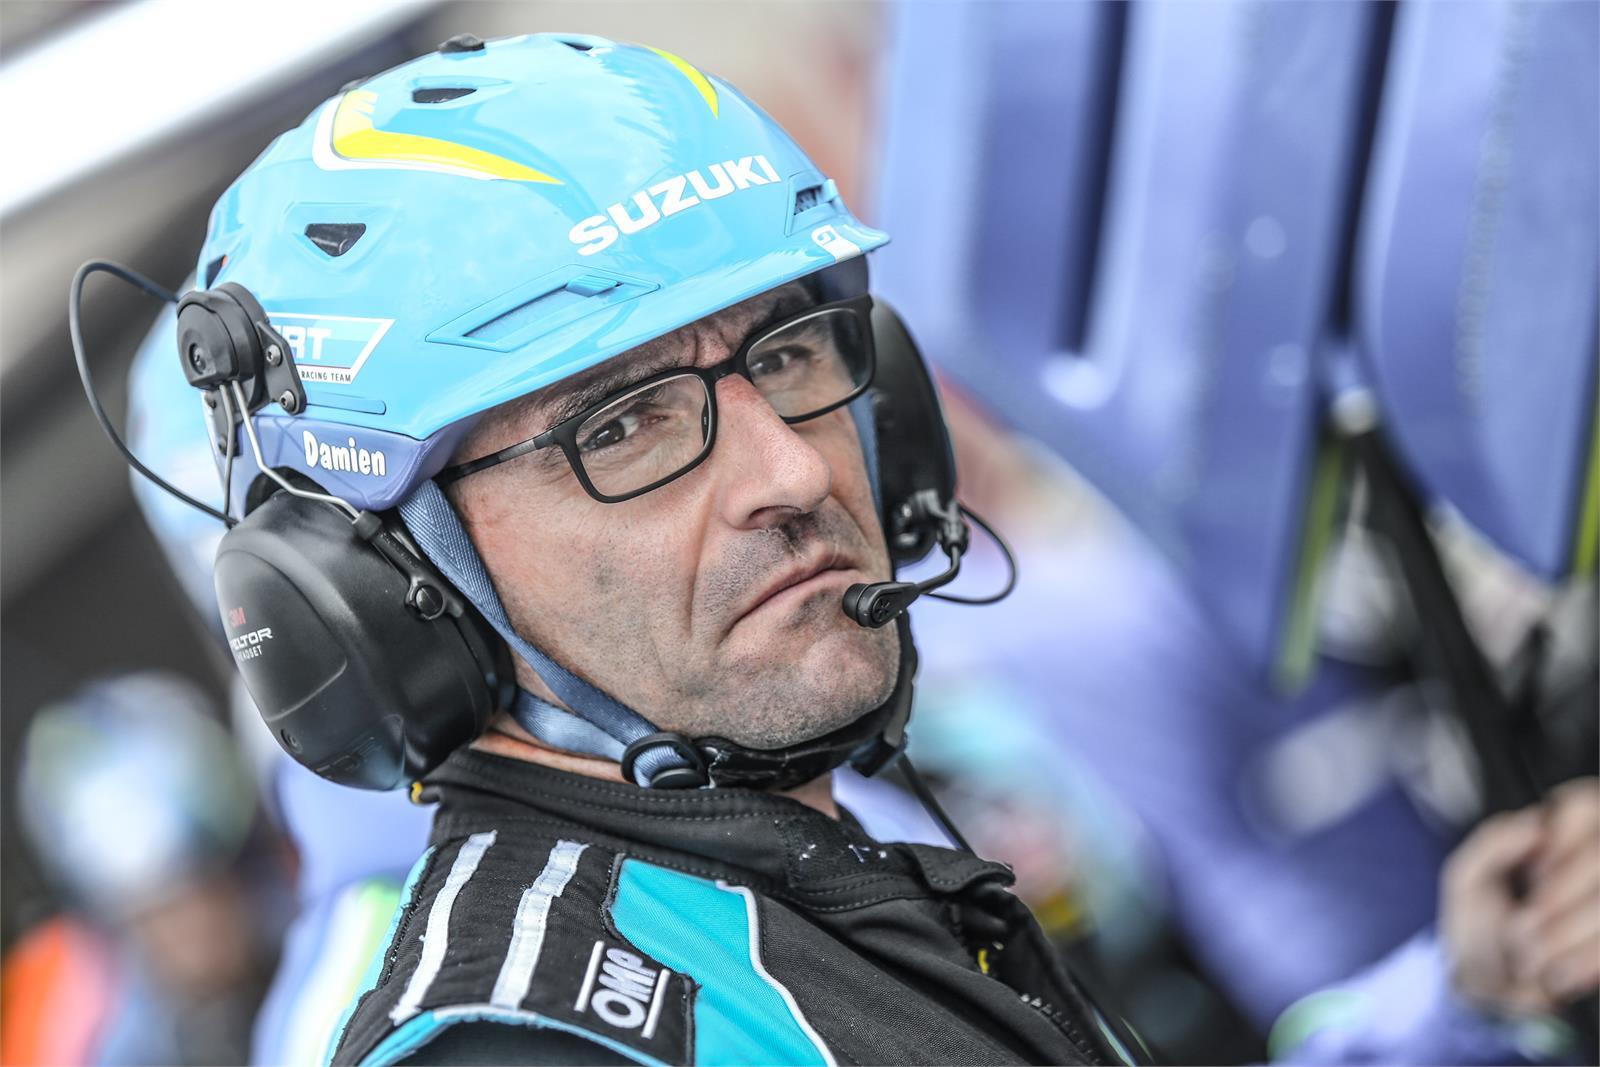 SERT Damien Saulnier「今はバイクのハンドリングと信頼性を磨いていくのみ」